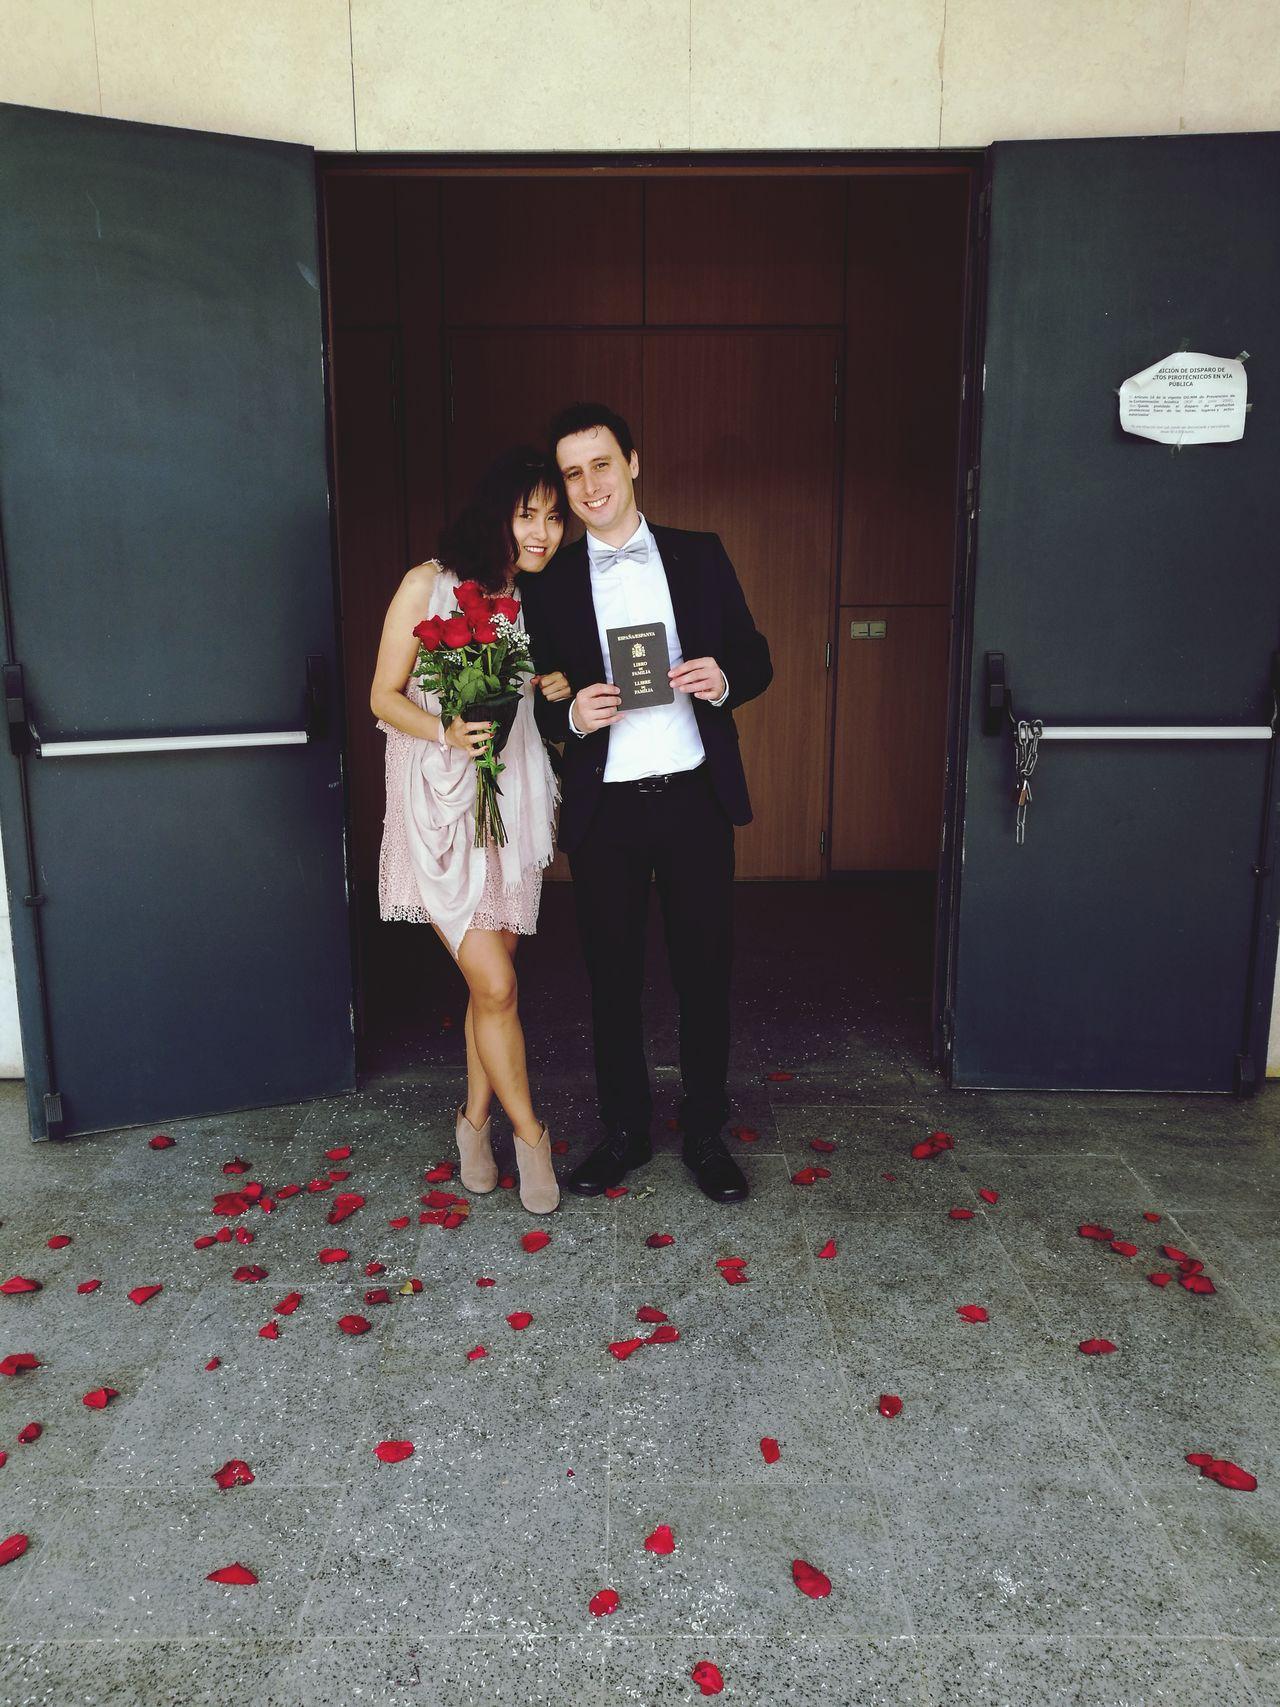 Love Just Married Love ♥ Amor ♥ Justmarried💑 Justmarried Just Married! ♥ Just Married ❤